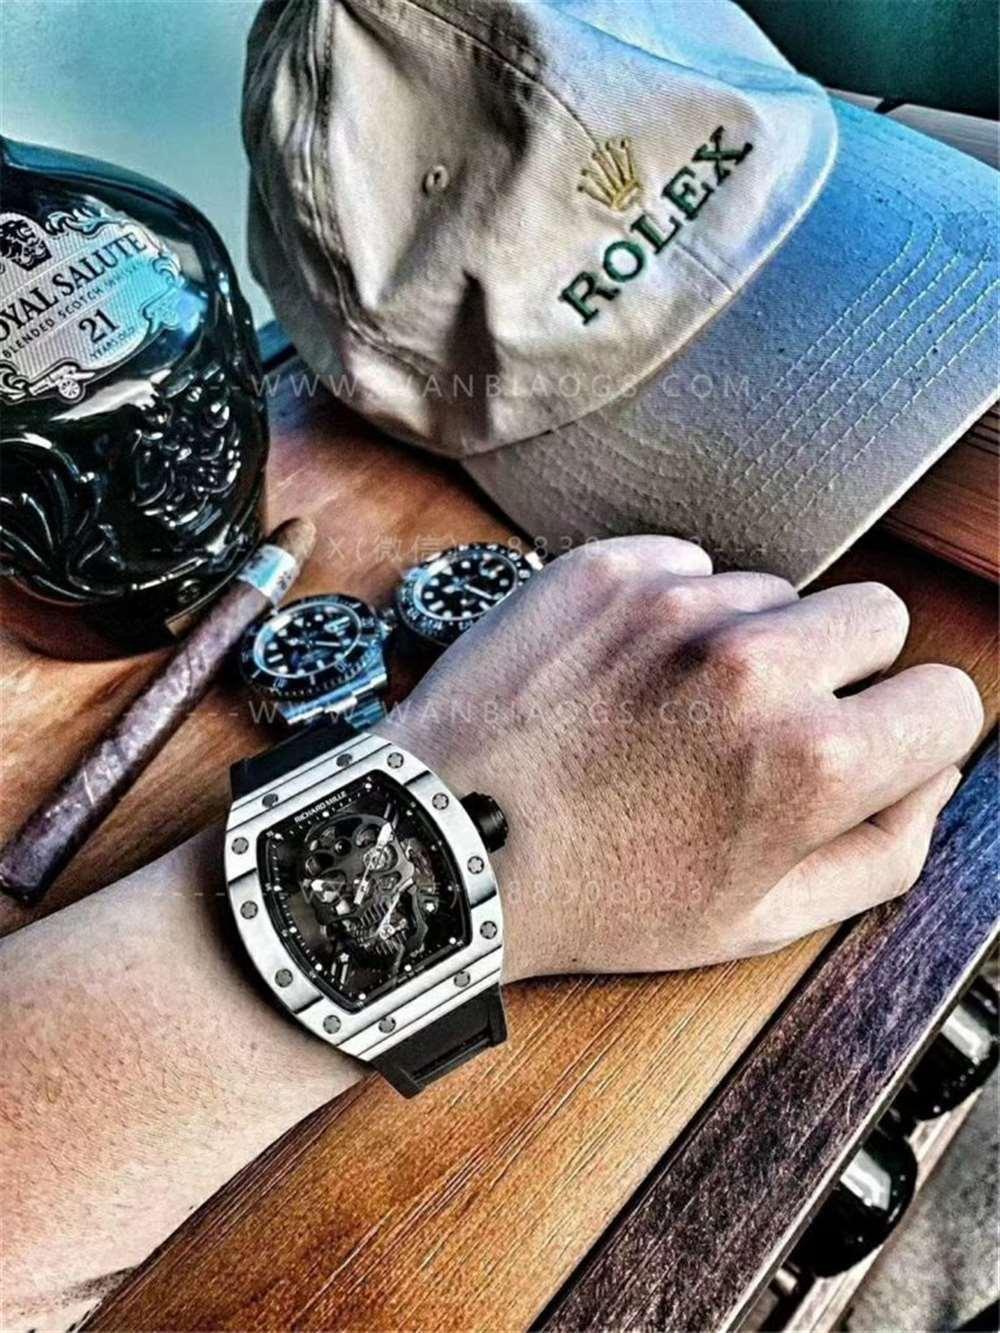 JB理查德米勒RM52-01真陀飞轮腕表深度评测